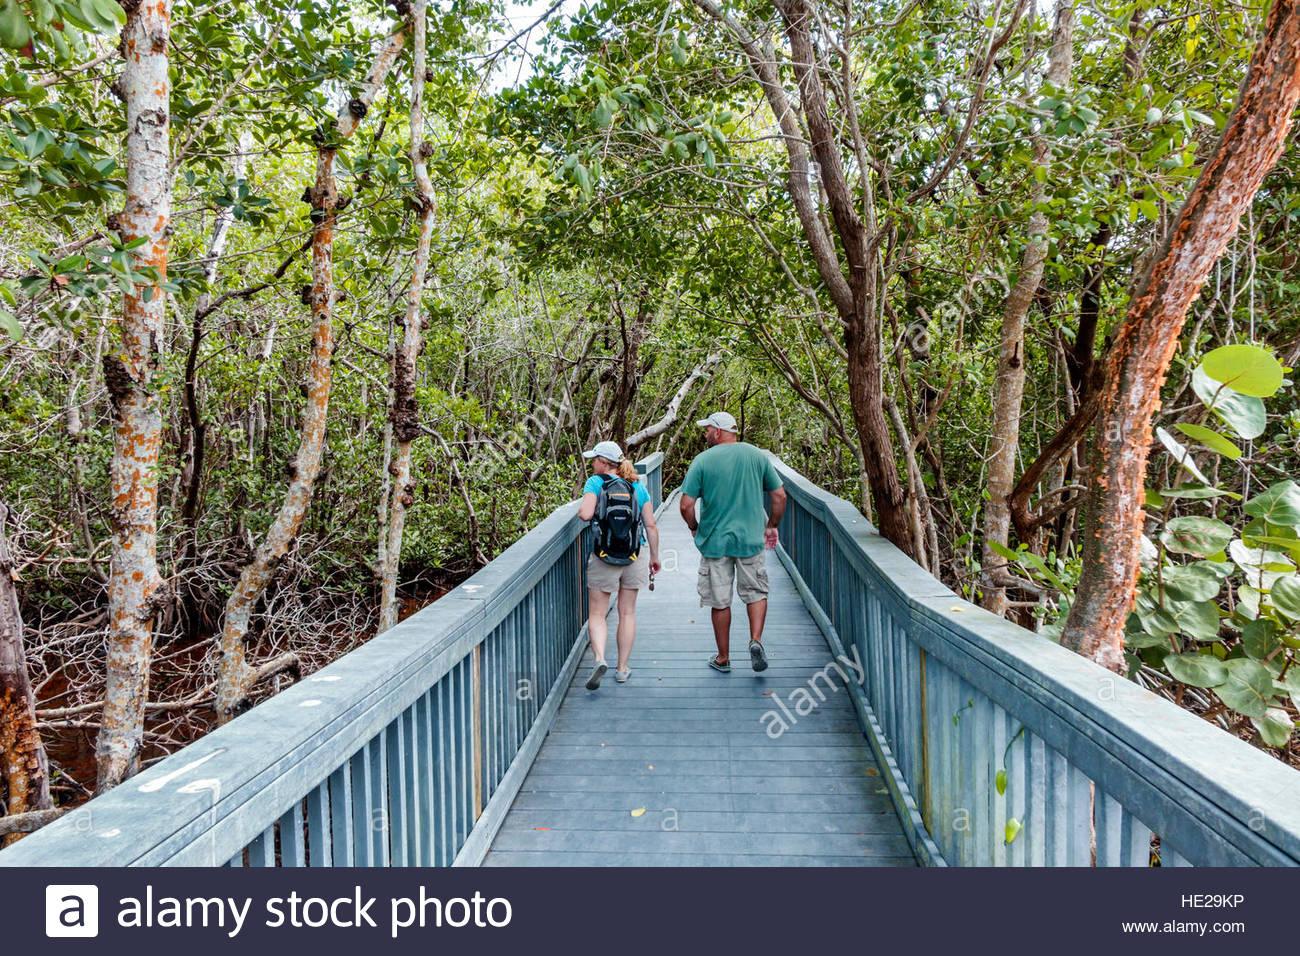 Sanibel Island Florida J. N. J.N. JN Ding Darling National Wildlife Refuge nature boardwalk couple Stock Photo